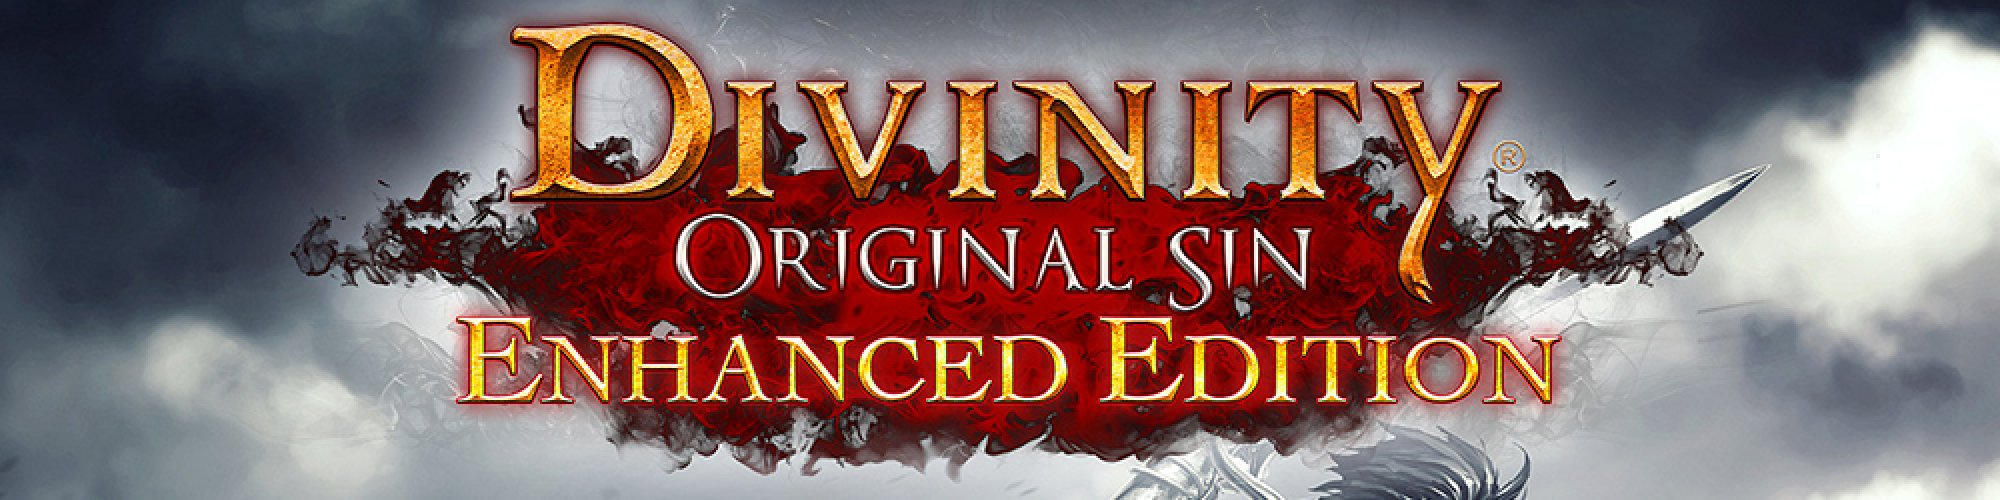 Divinity Original Sin Enhanced Edition banner